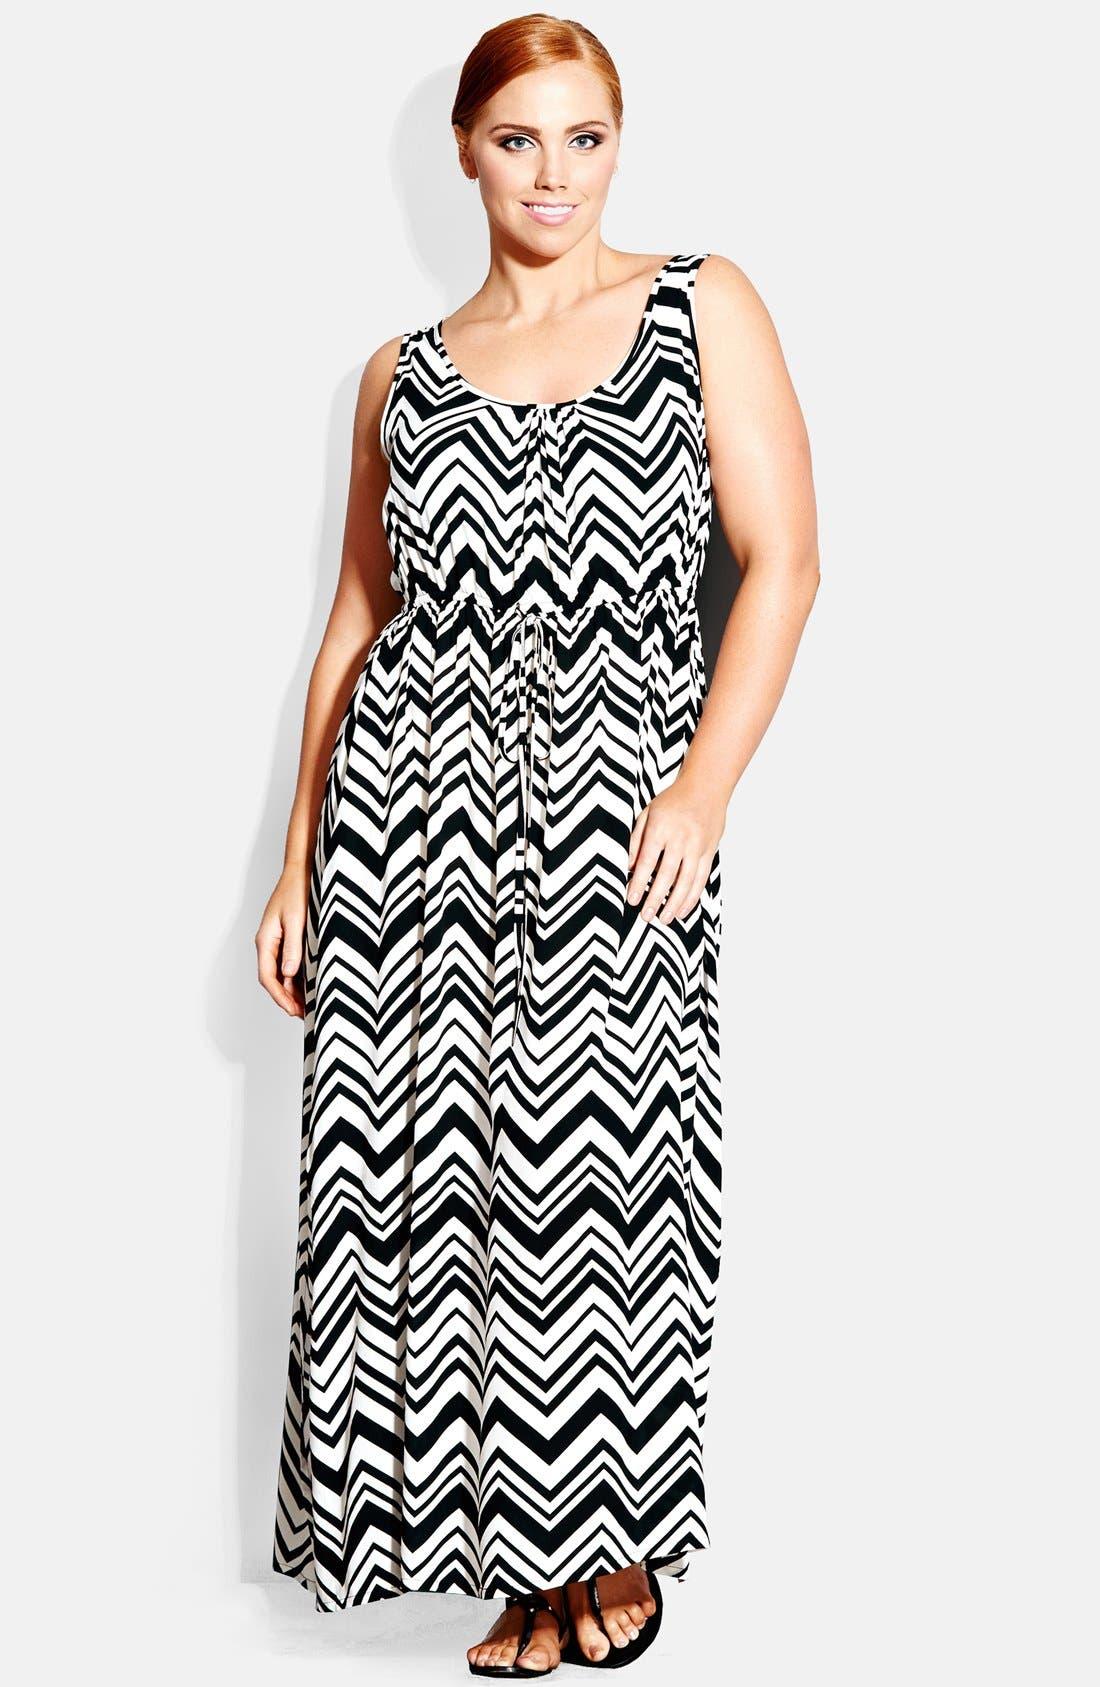 Alternate Image 1 Selected - City Chic 'Jamaica' Maxi Dress (Plus Size)